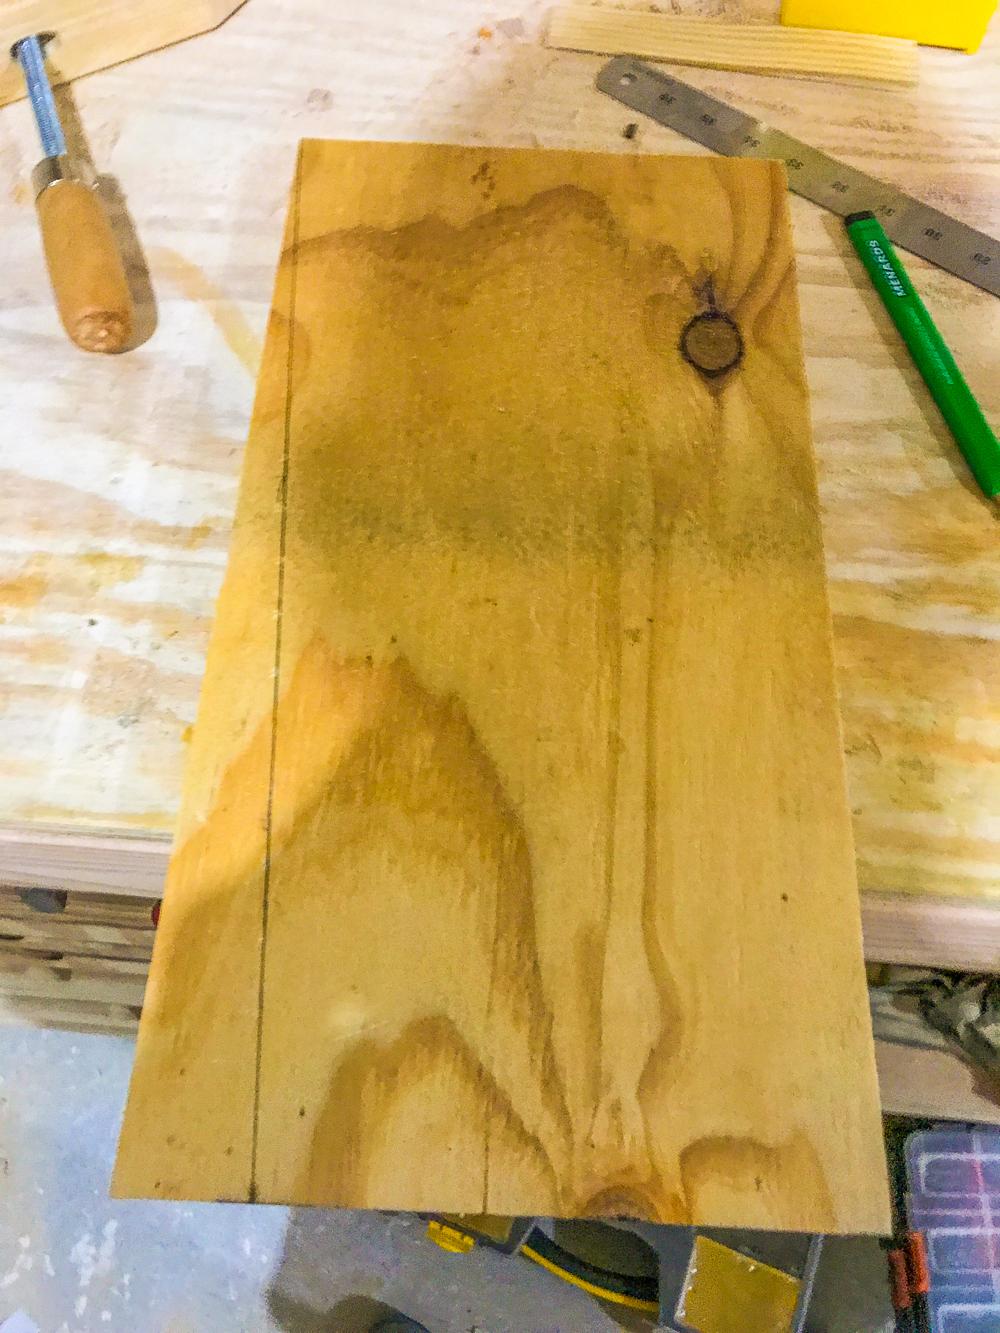 Lumber Cart - Bin Angle marked